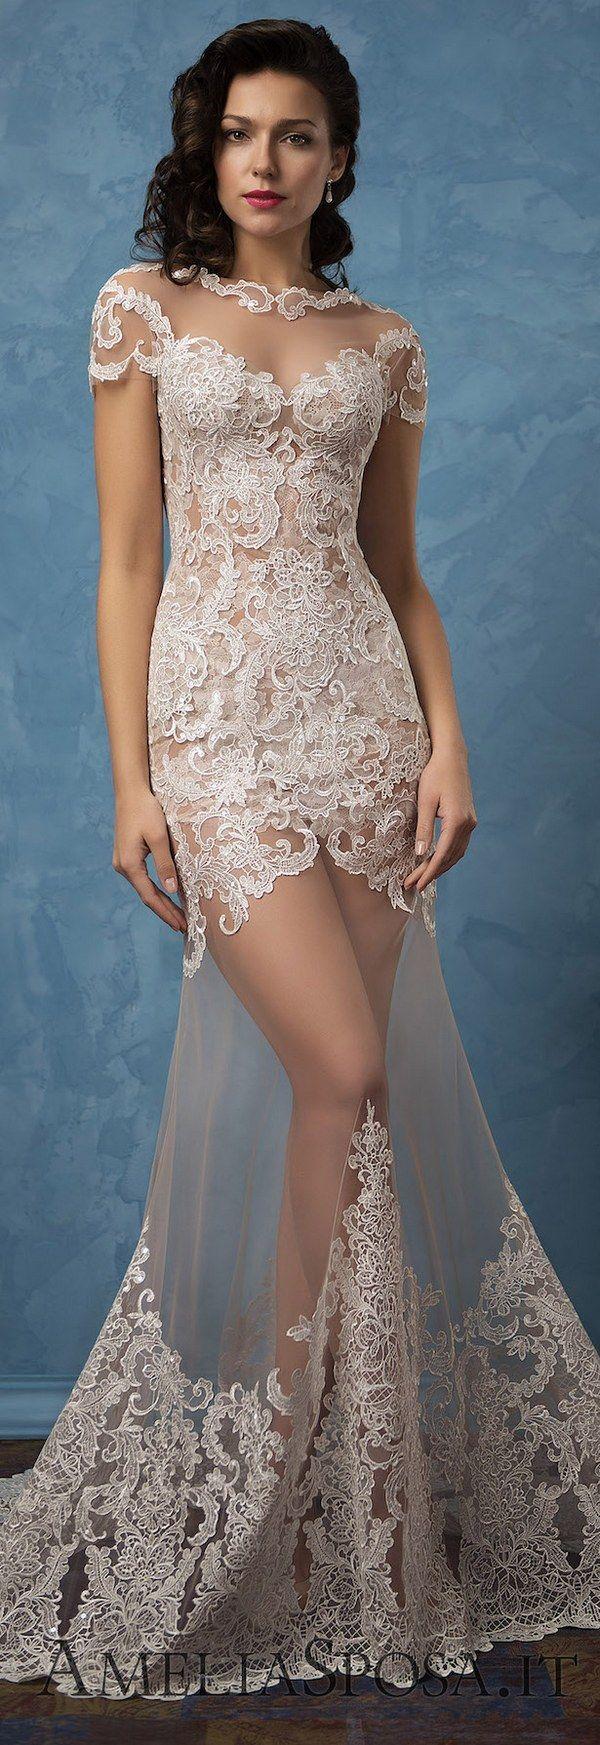 Long sleeves wedding dresses from belfaso weddingideas dress lace